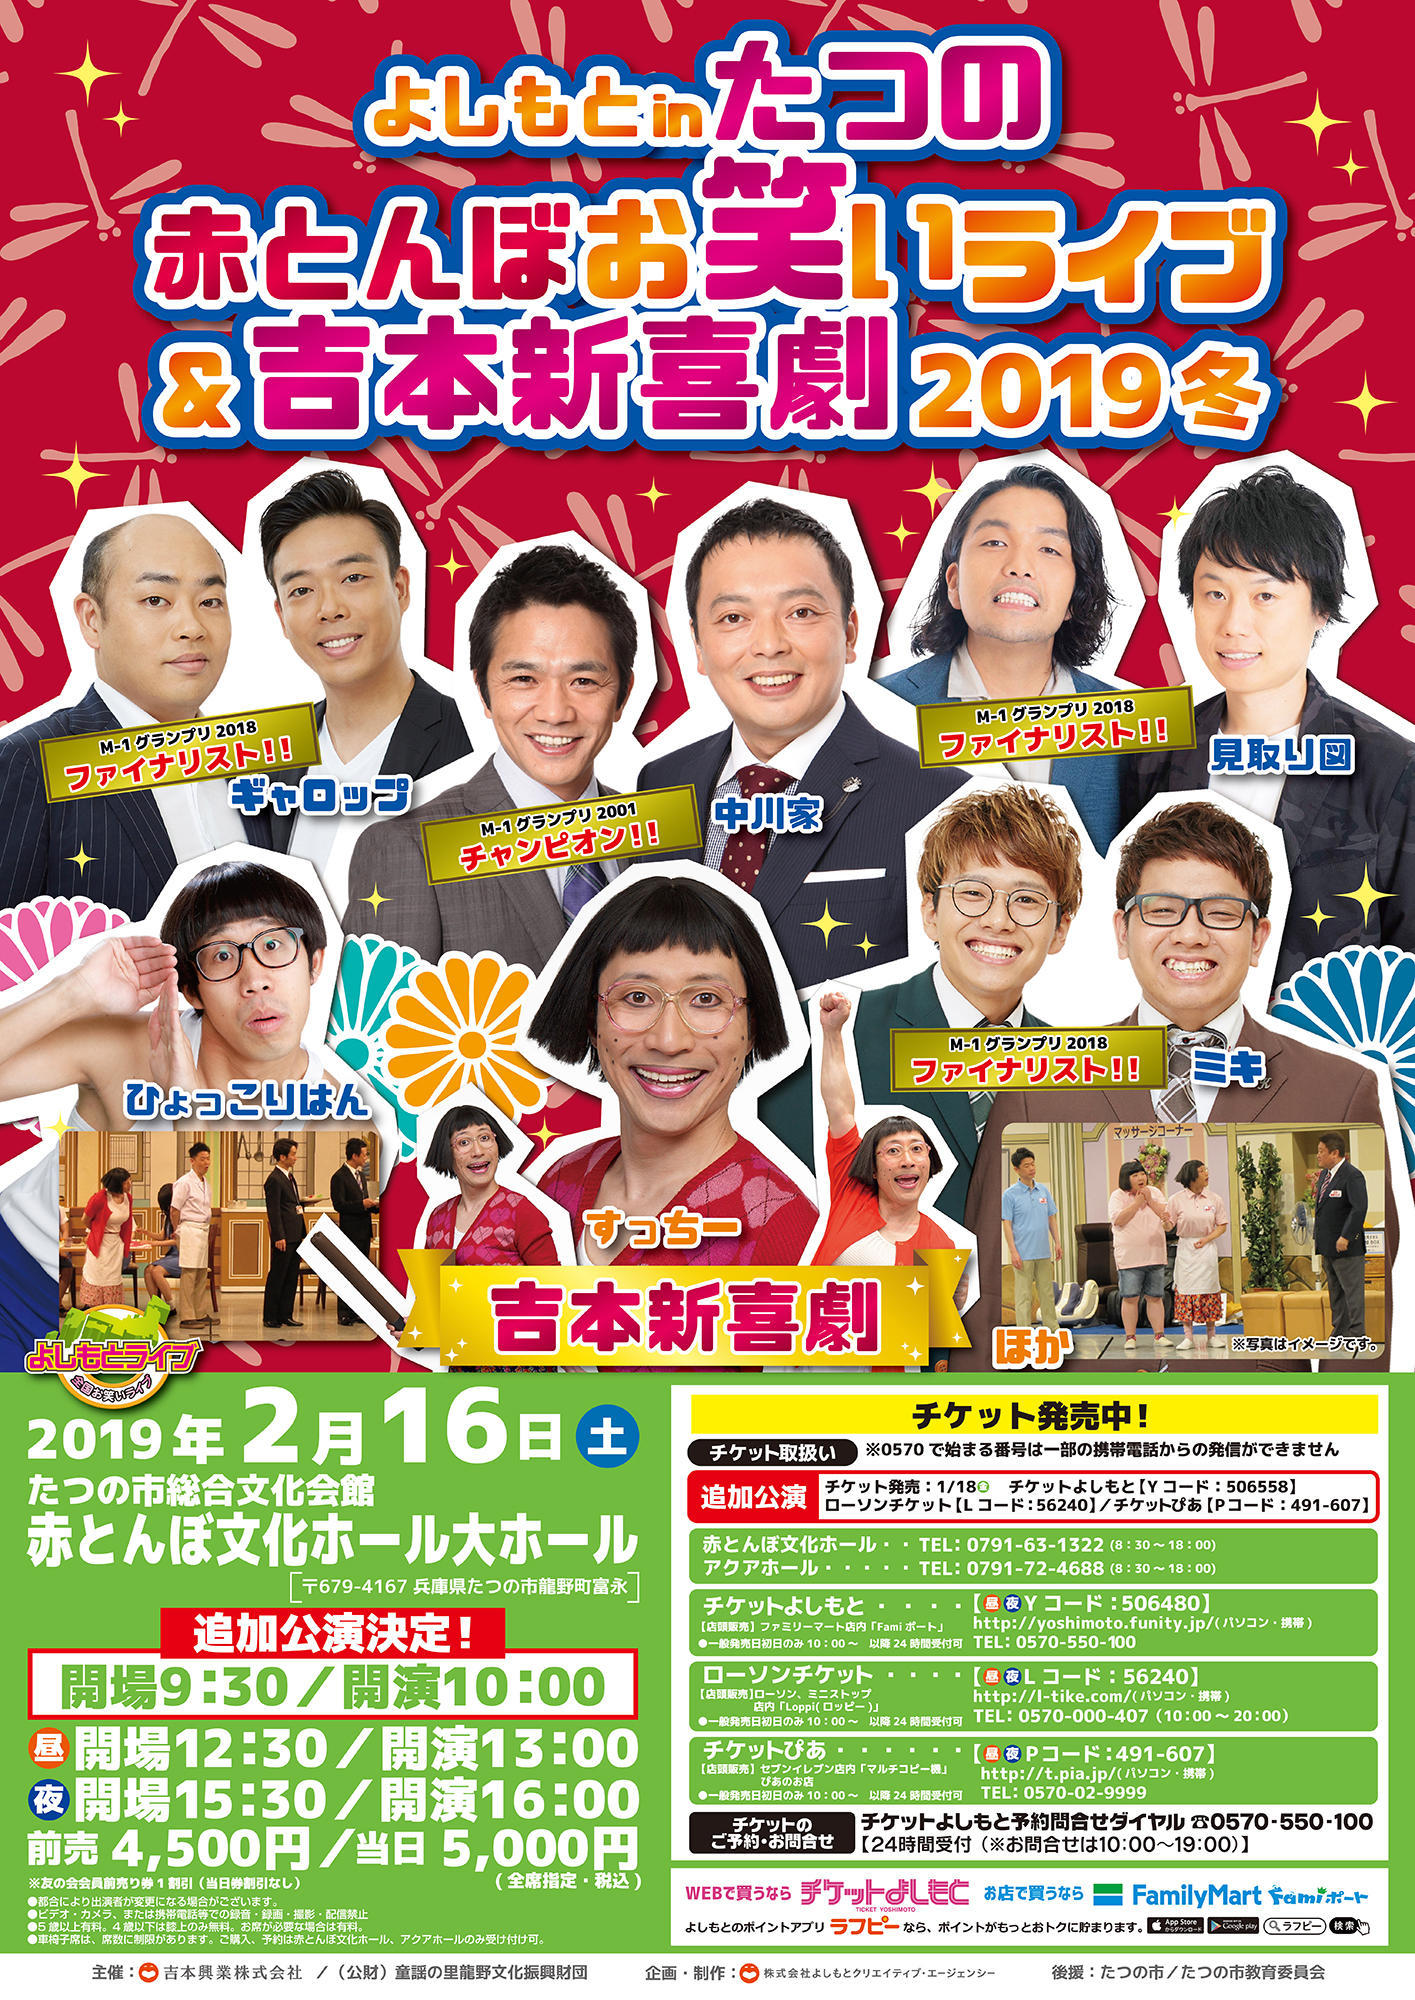 http://www.syumatsu.jp/20190206184816-31f30aa8a635315c38c1f7b0047b4bc0e74fc417.jpg